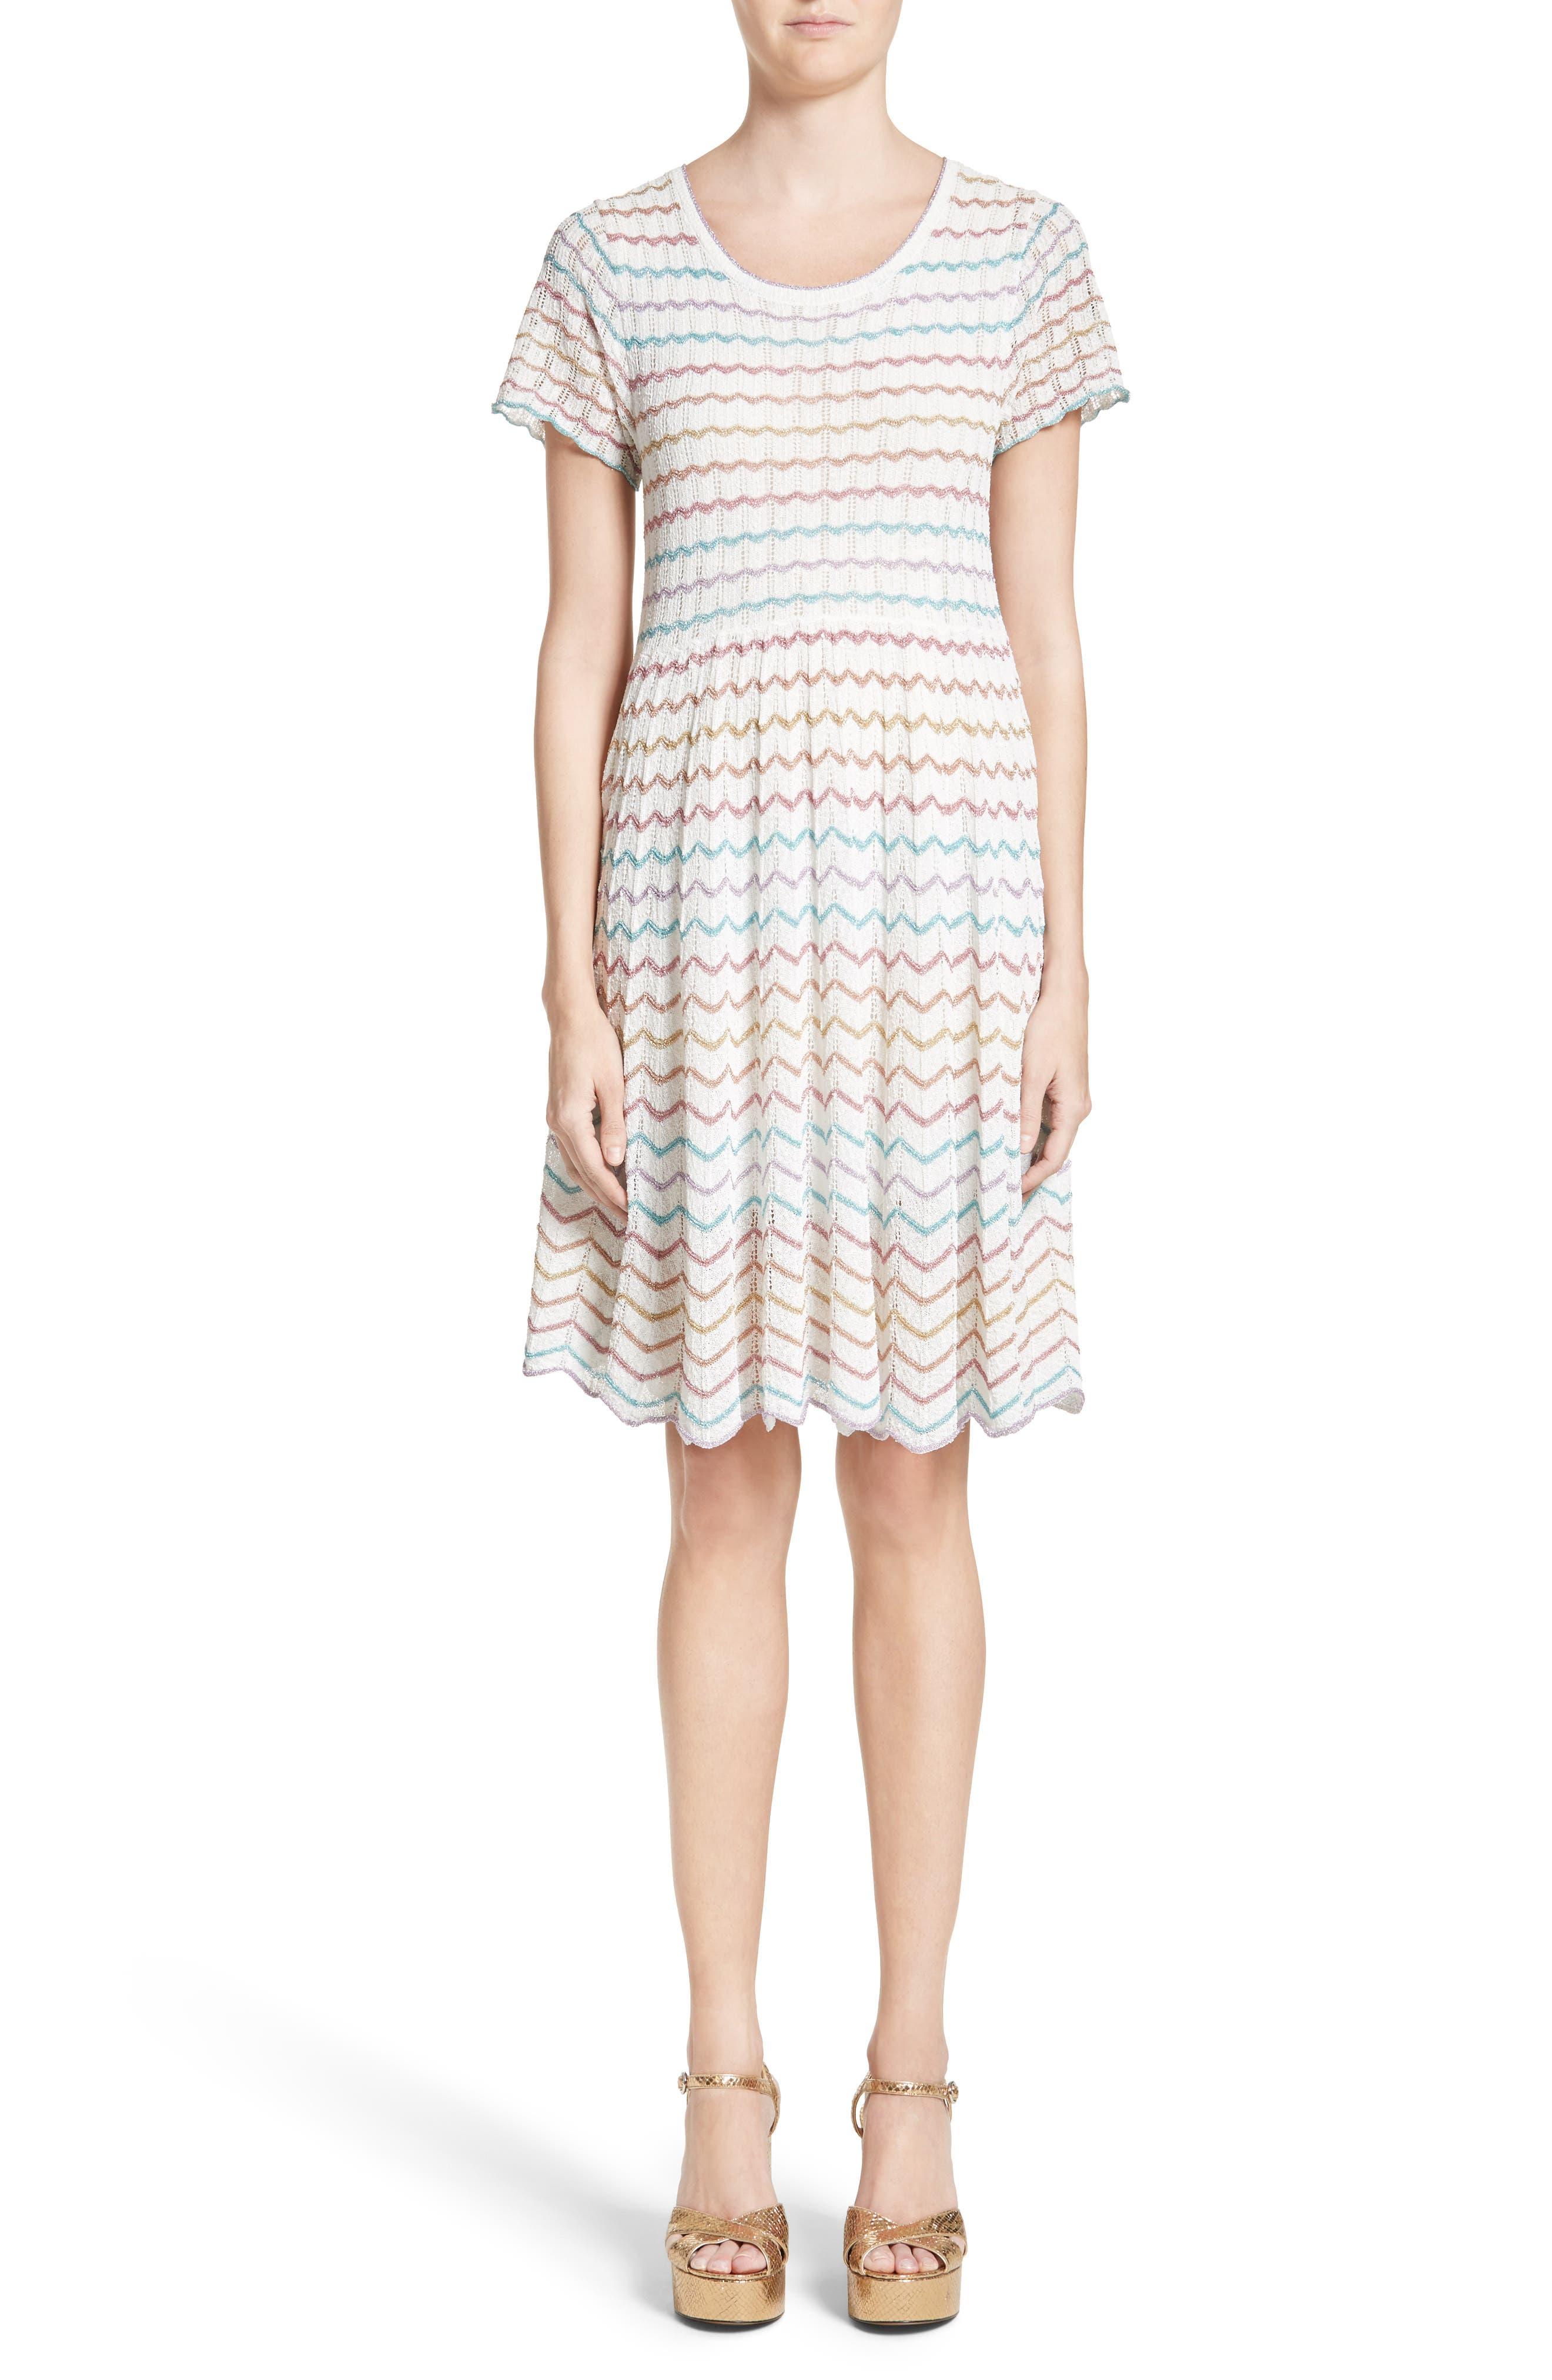 Main Image - MARC JACOBS Knit Babydoll Dress